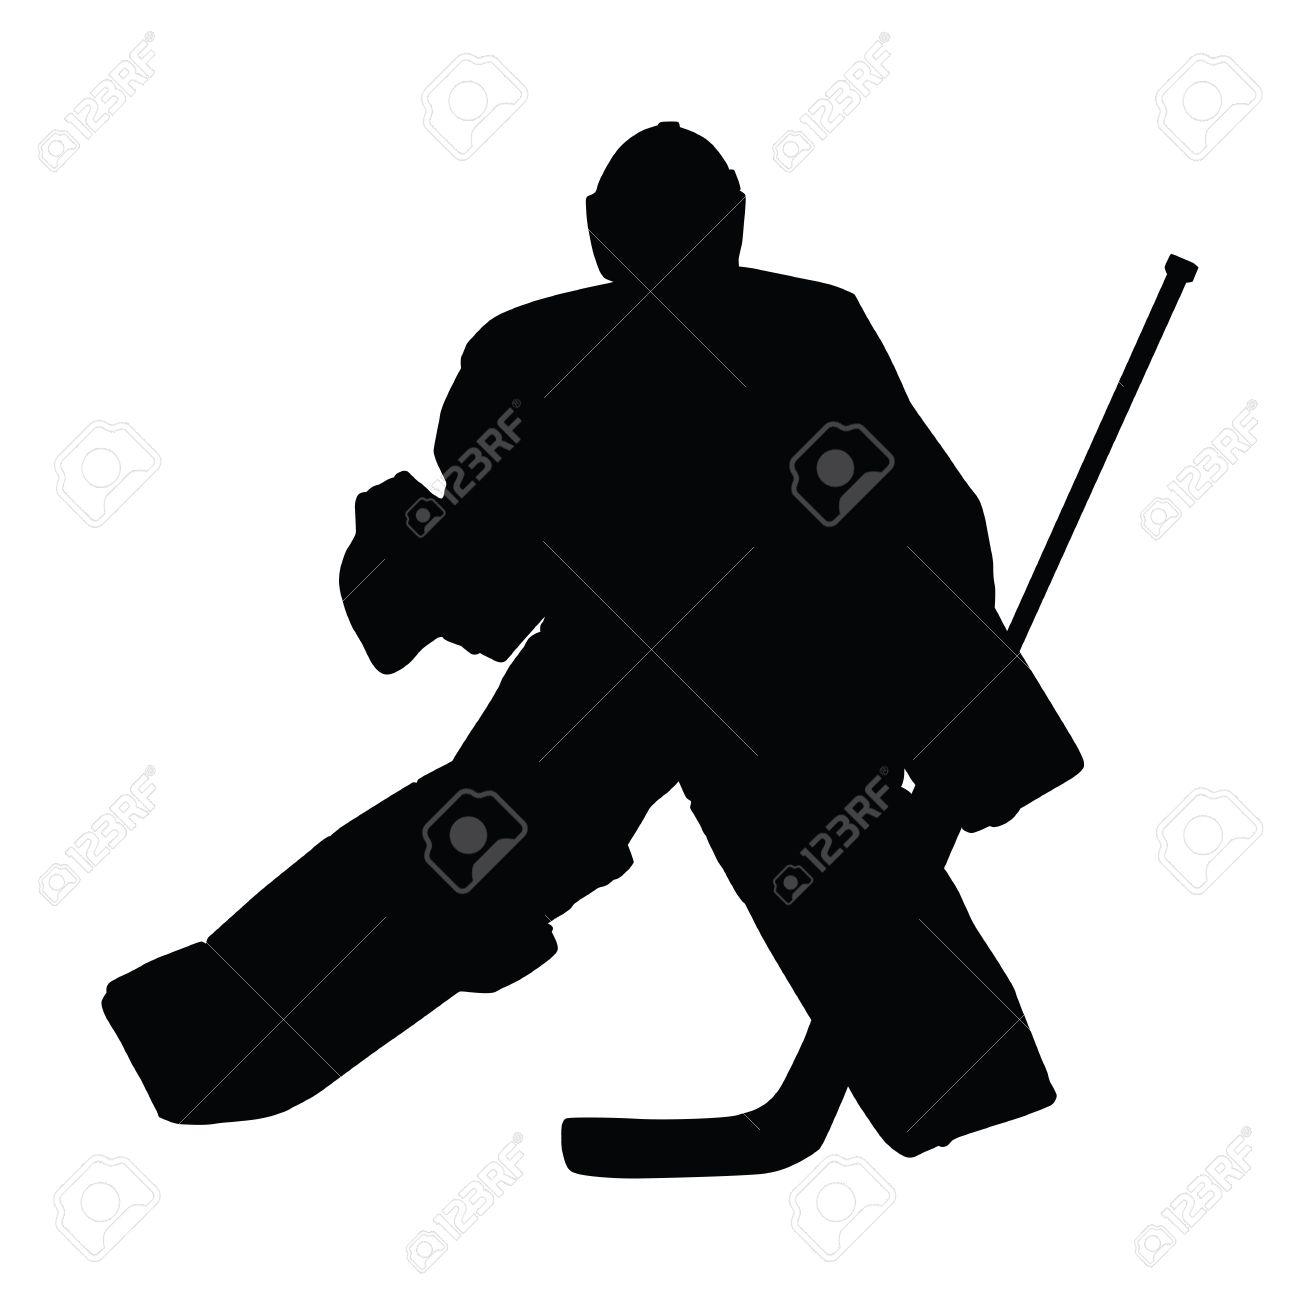 Goalie In Ice Hockey Moves Across Ice In Hockey Goal Hockey